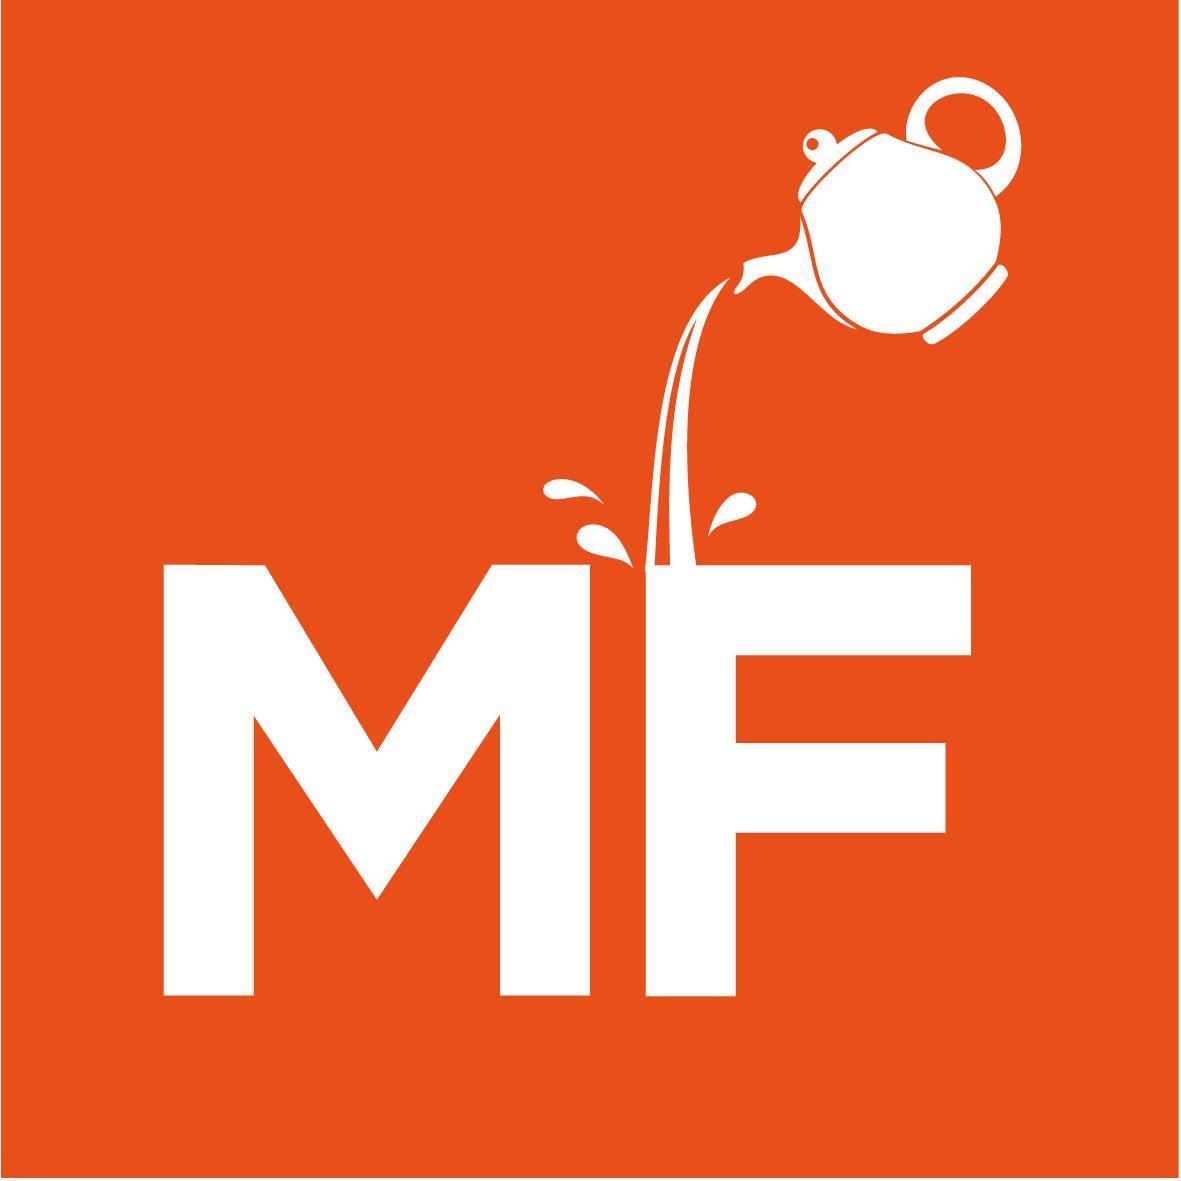 The Museum Freelance Covid-19 Hardship Fund